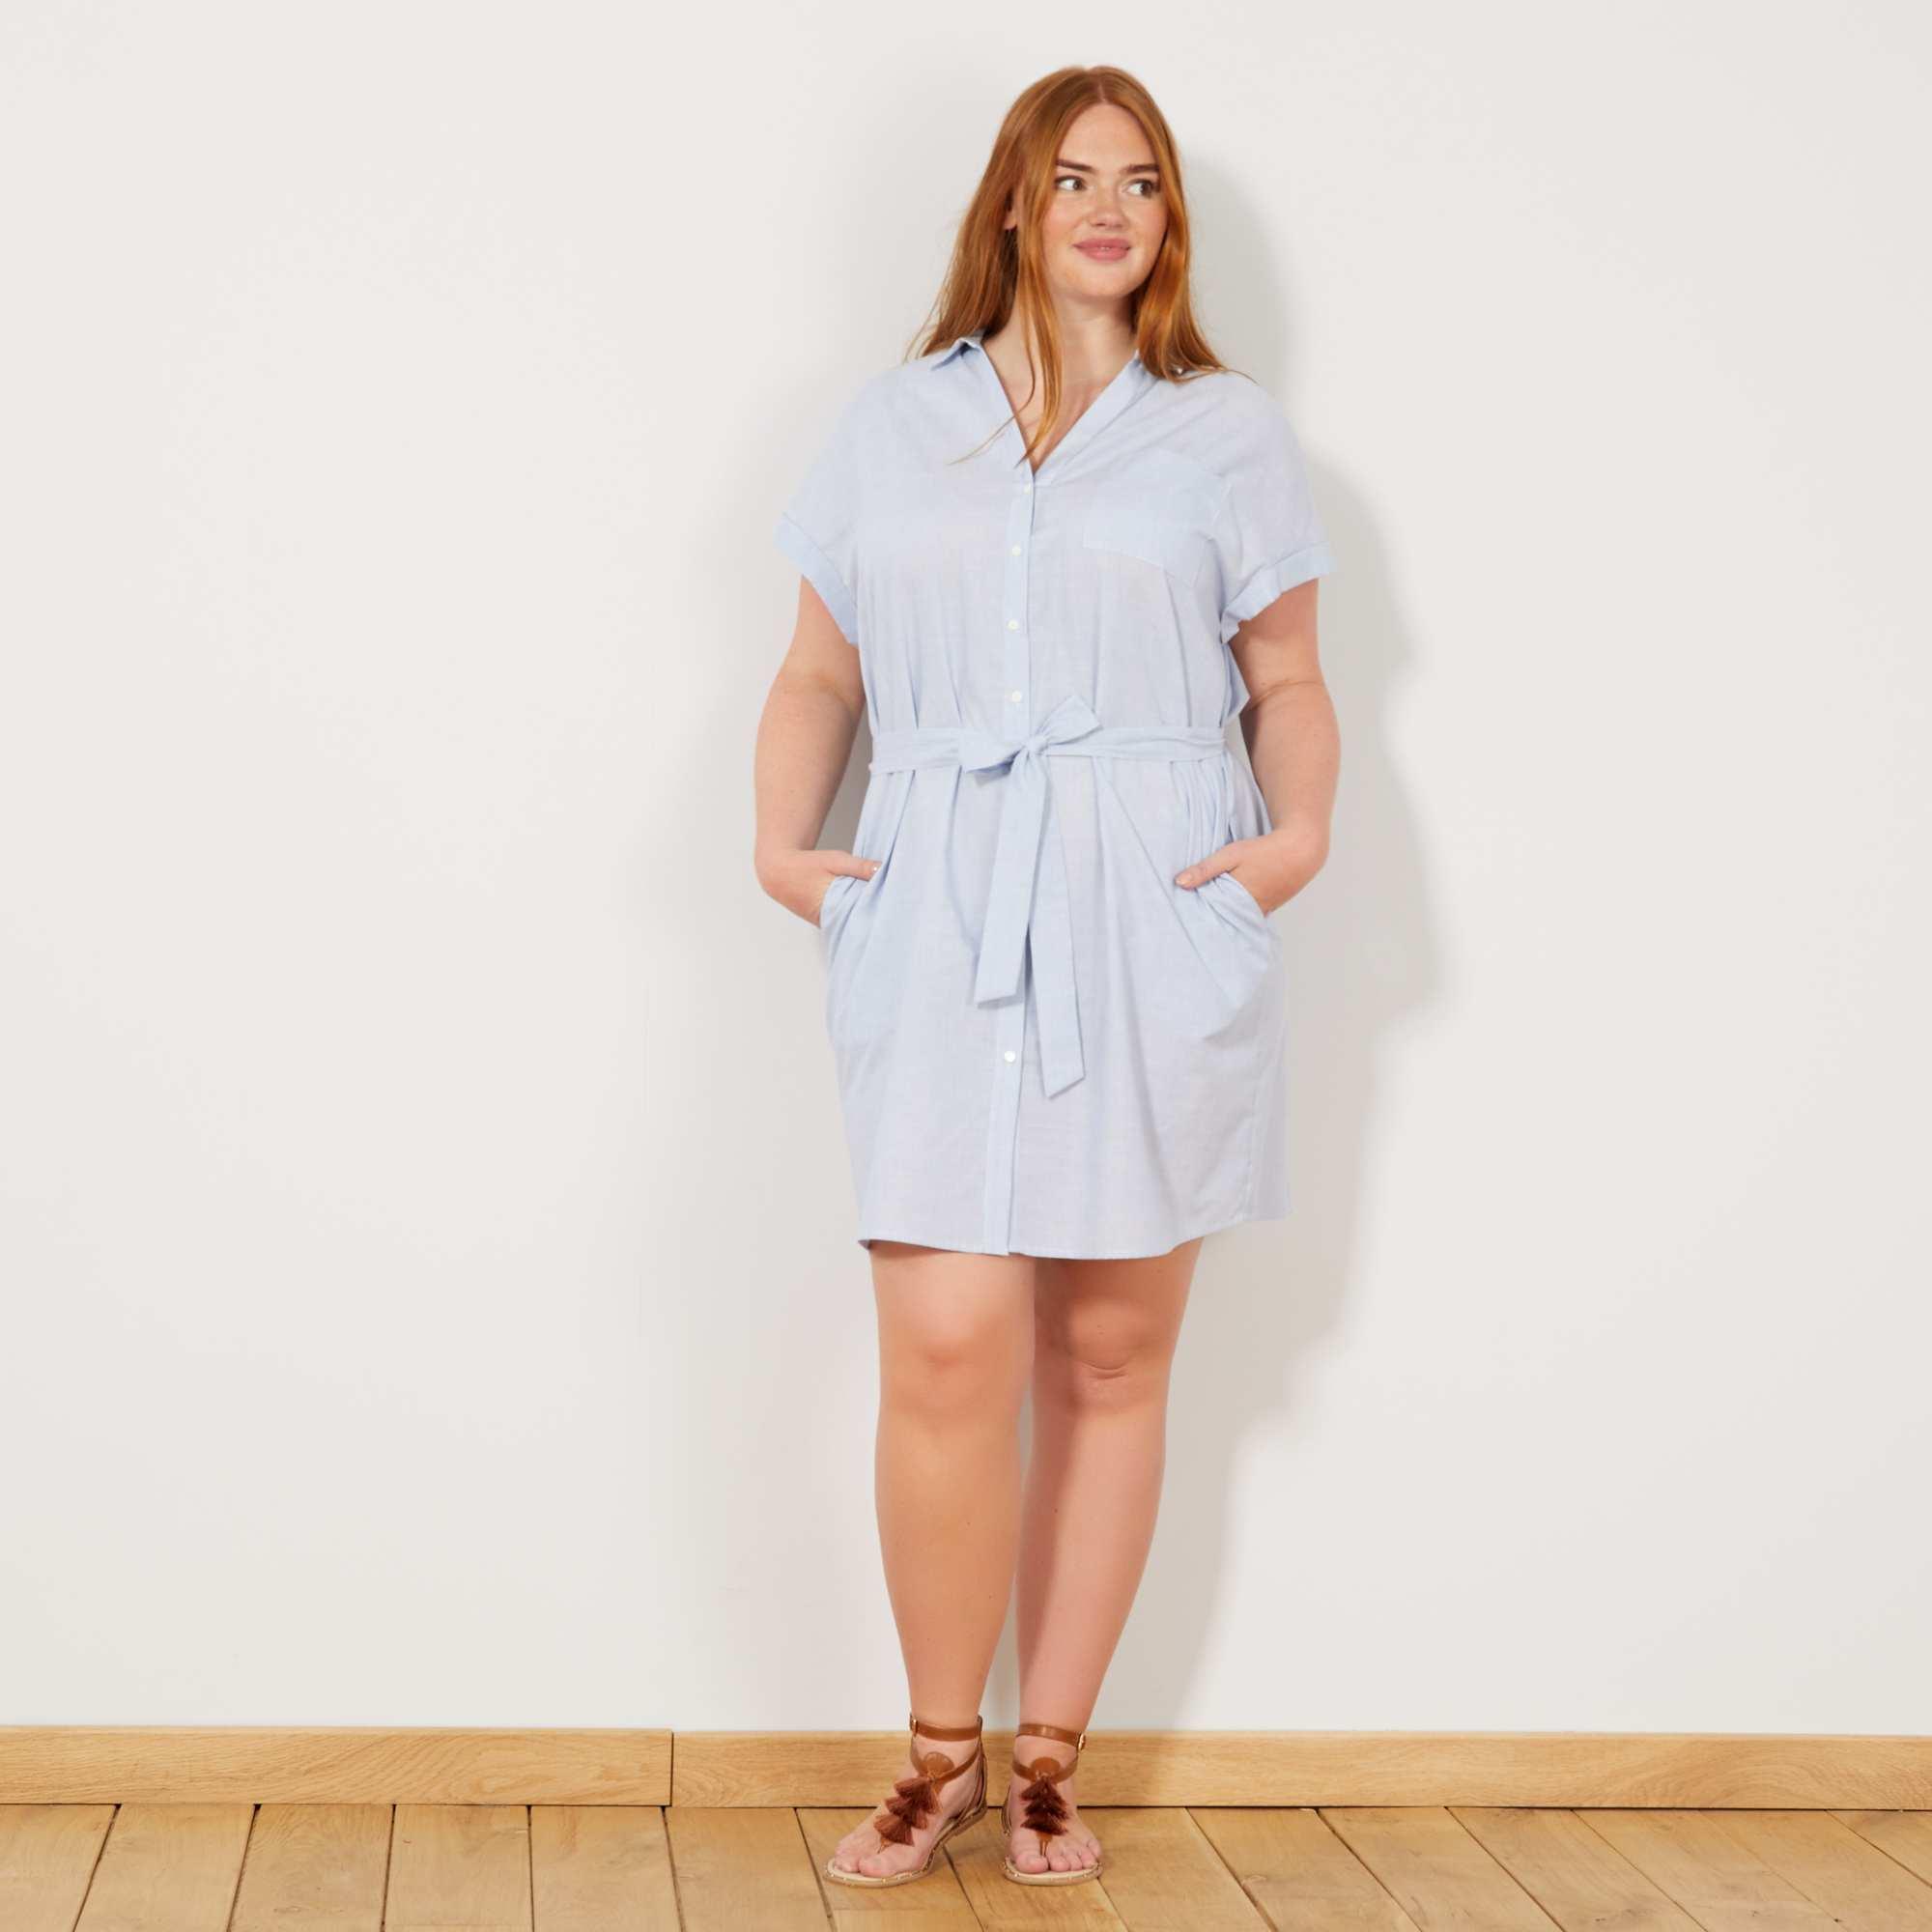 8c4a532b98097a Gestreepte blousejurk Dames size+ - blauw gestreept - Kiabi - 20